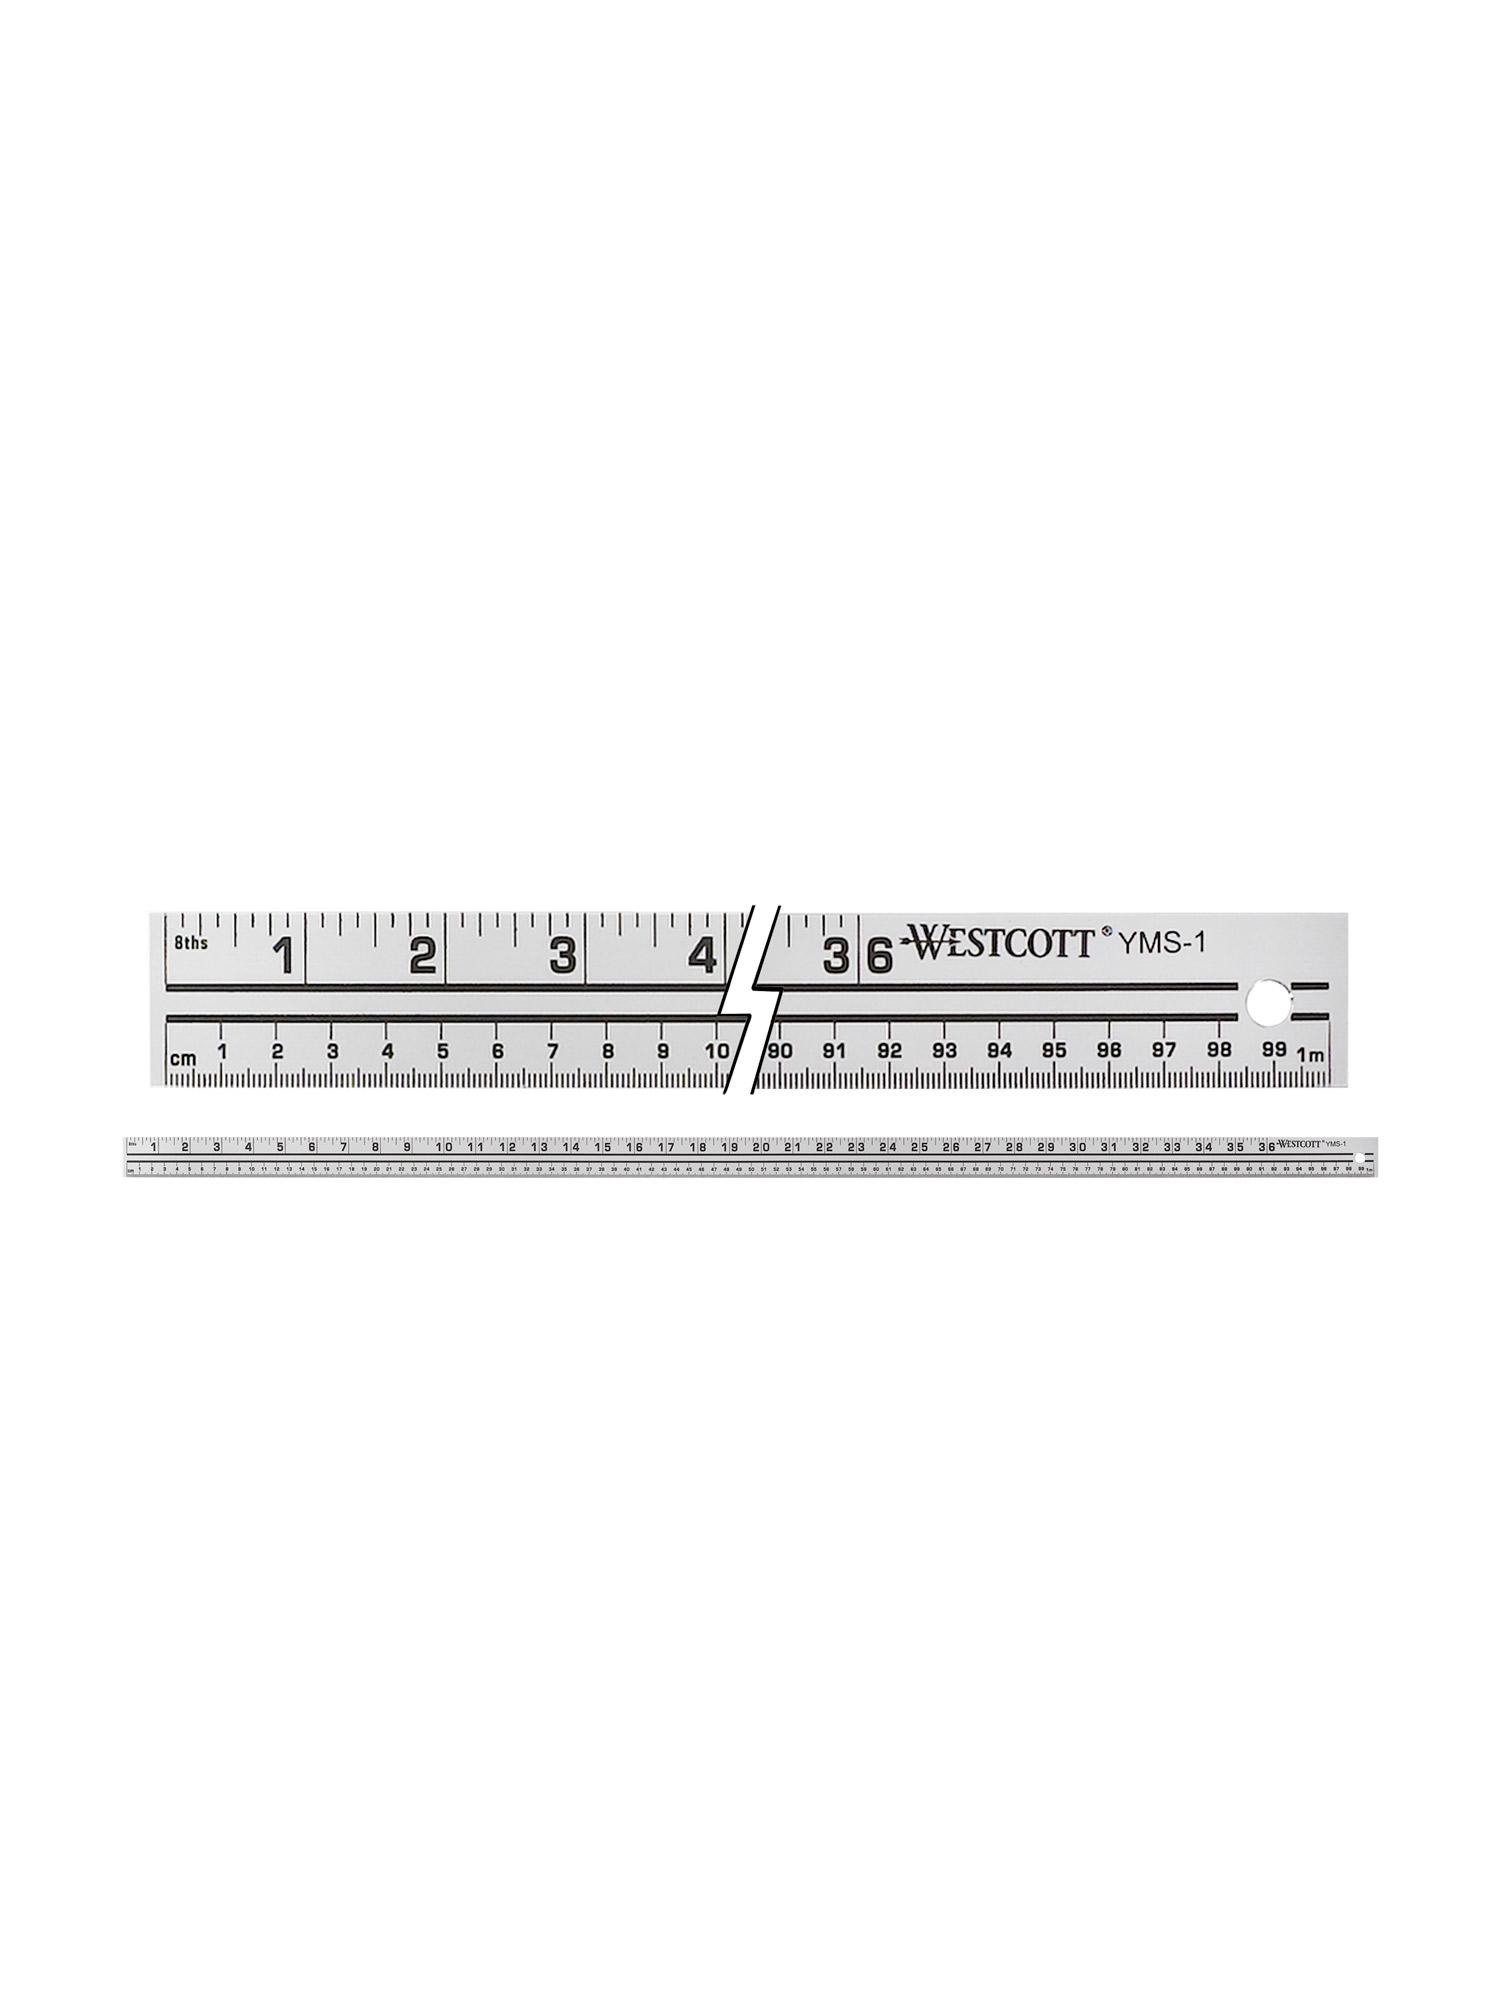 westcott yms-1 39in aluminum yard/meter stick